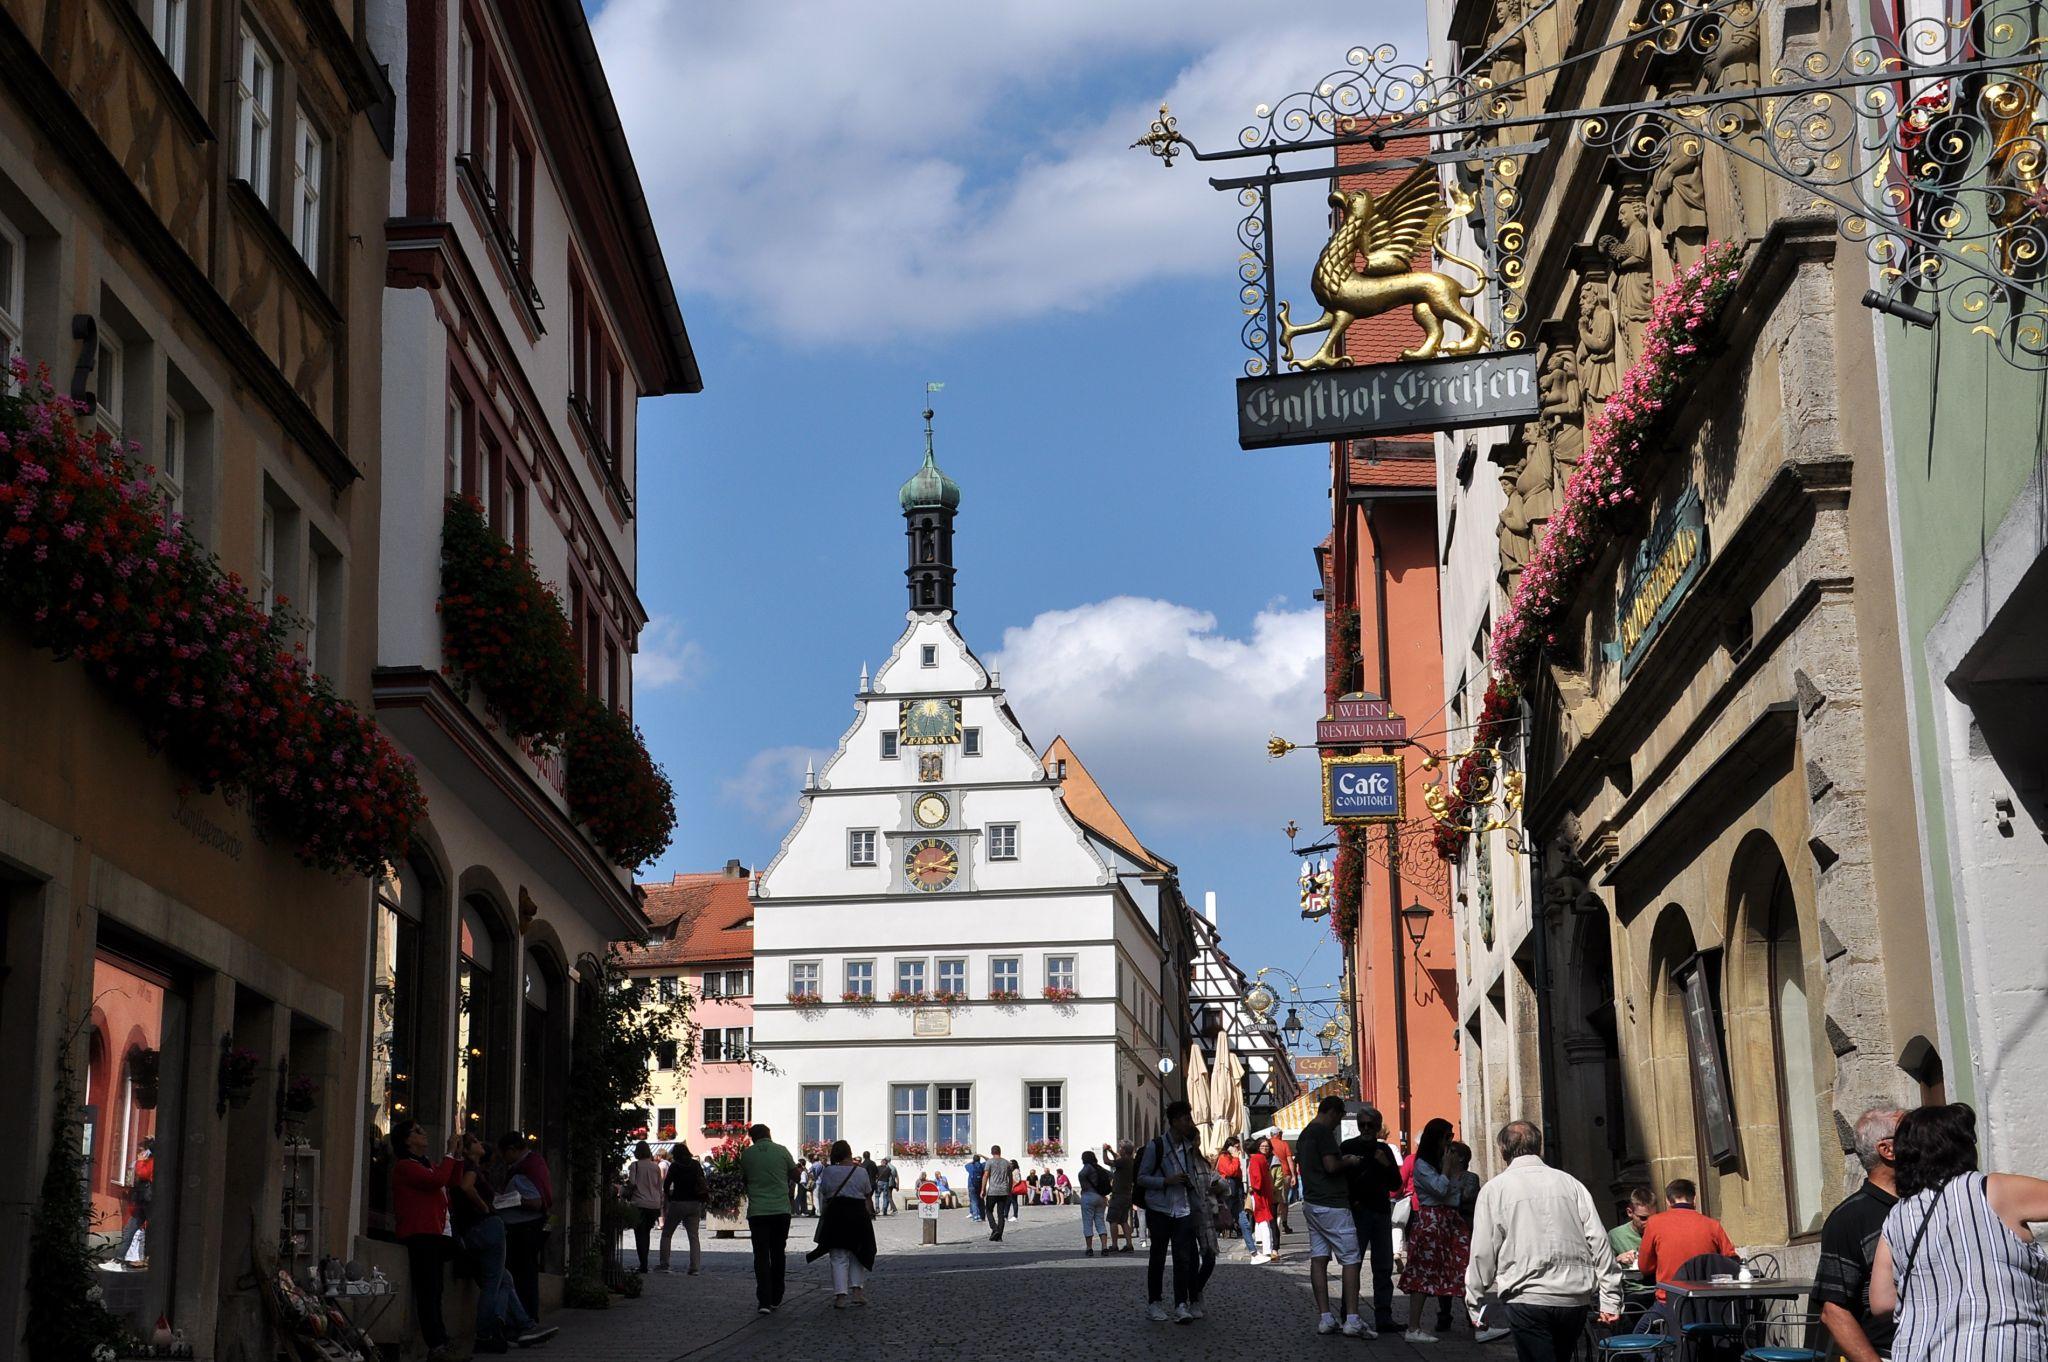 Ratstrinkstube Marktplatz, Germany